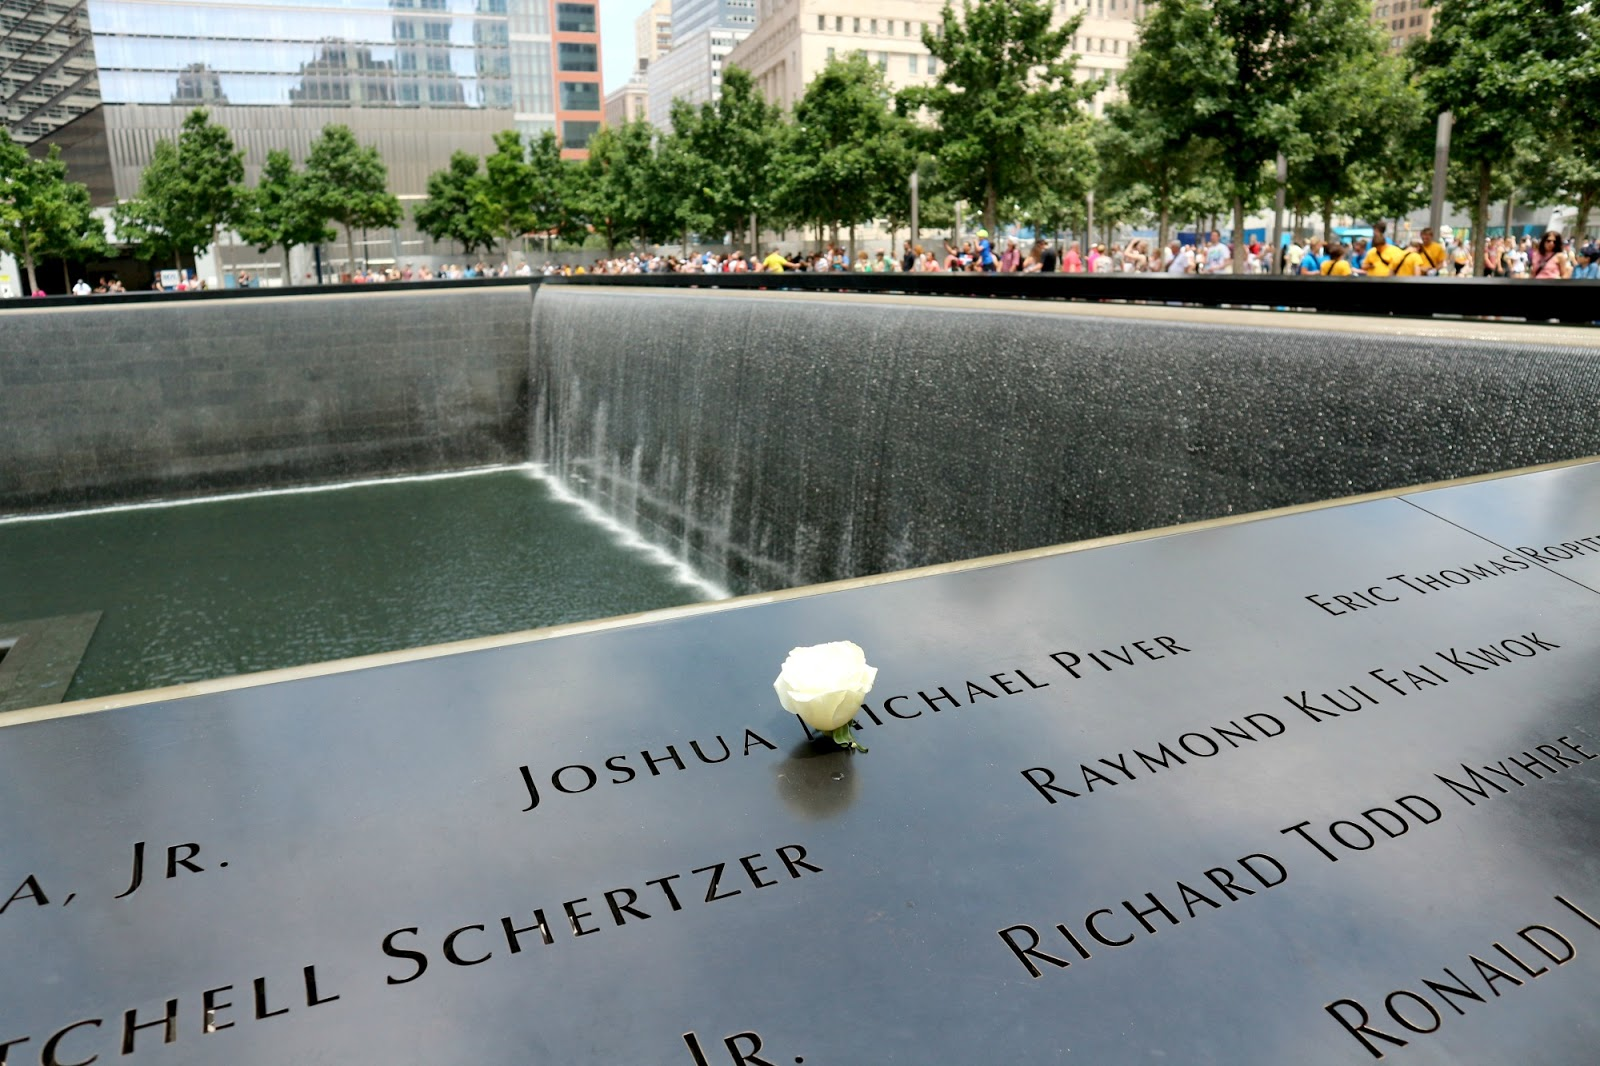 9 11 memorial fountain location